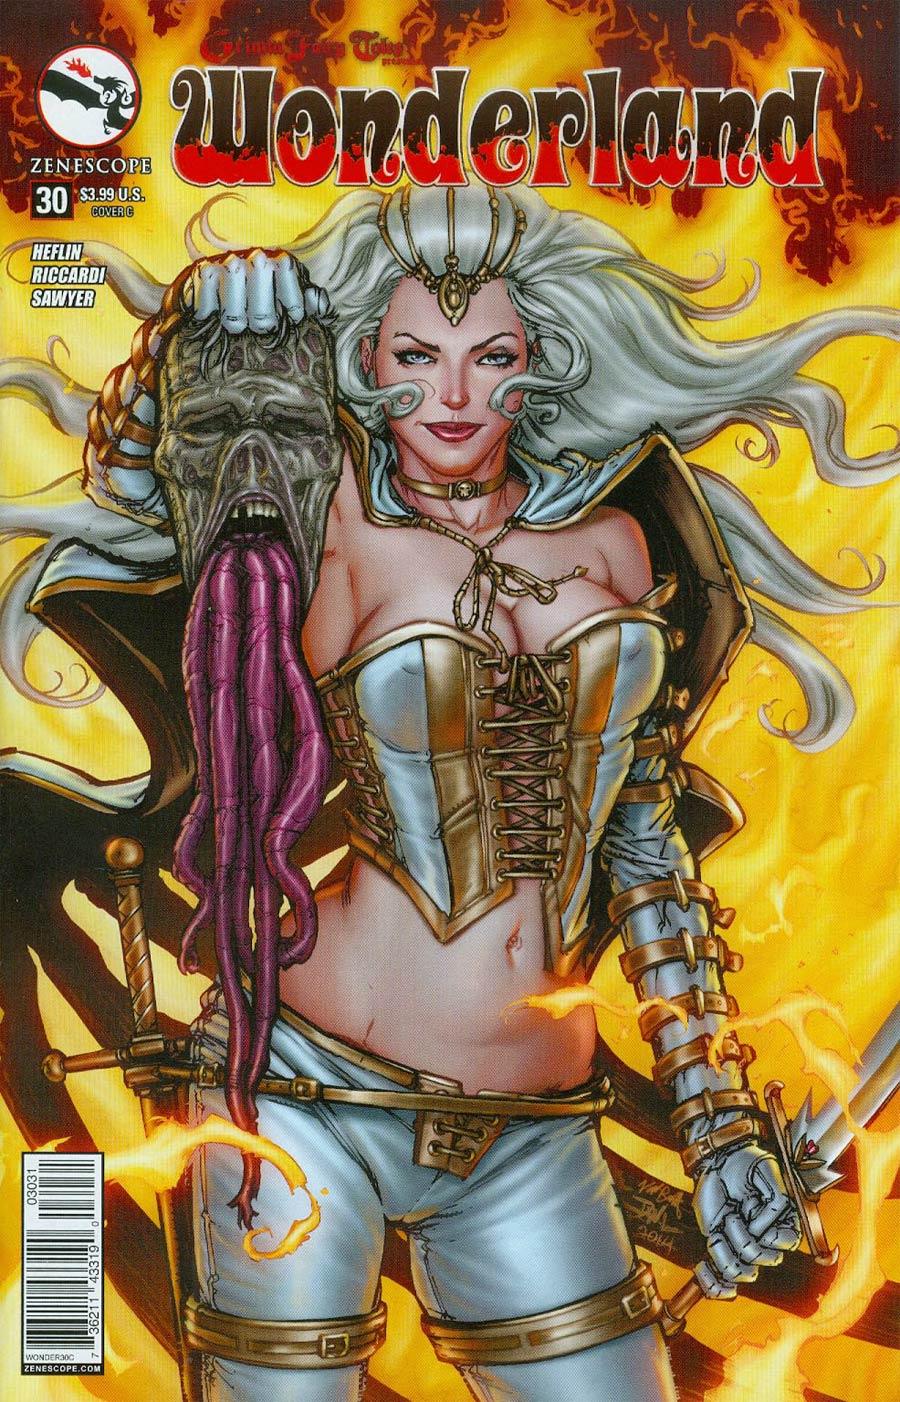 Grimm Fairy Tales Presents Wonderland Vol 2 #30 Cover C Daniel Leister